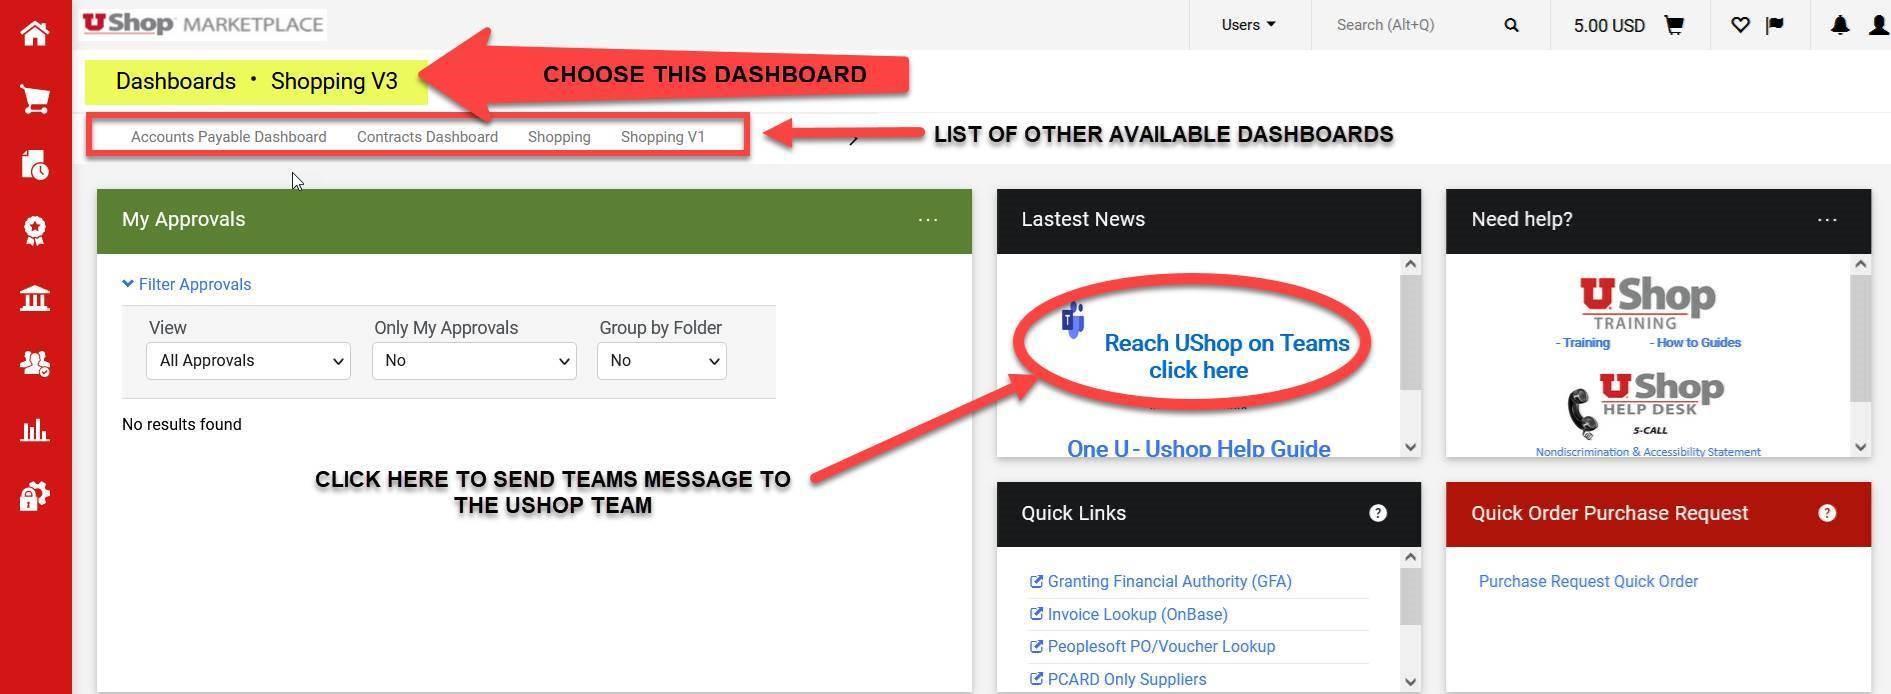 UShop Help Via Teams Now Available